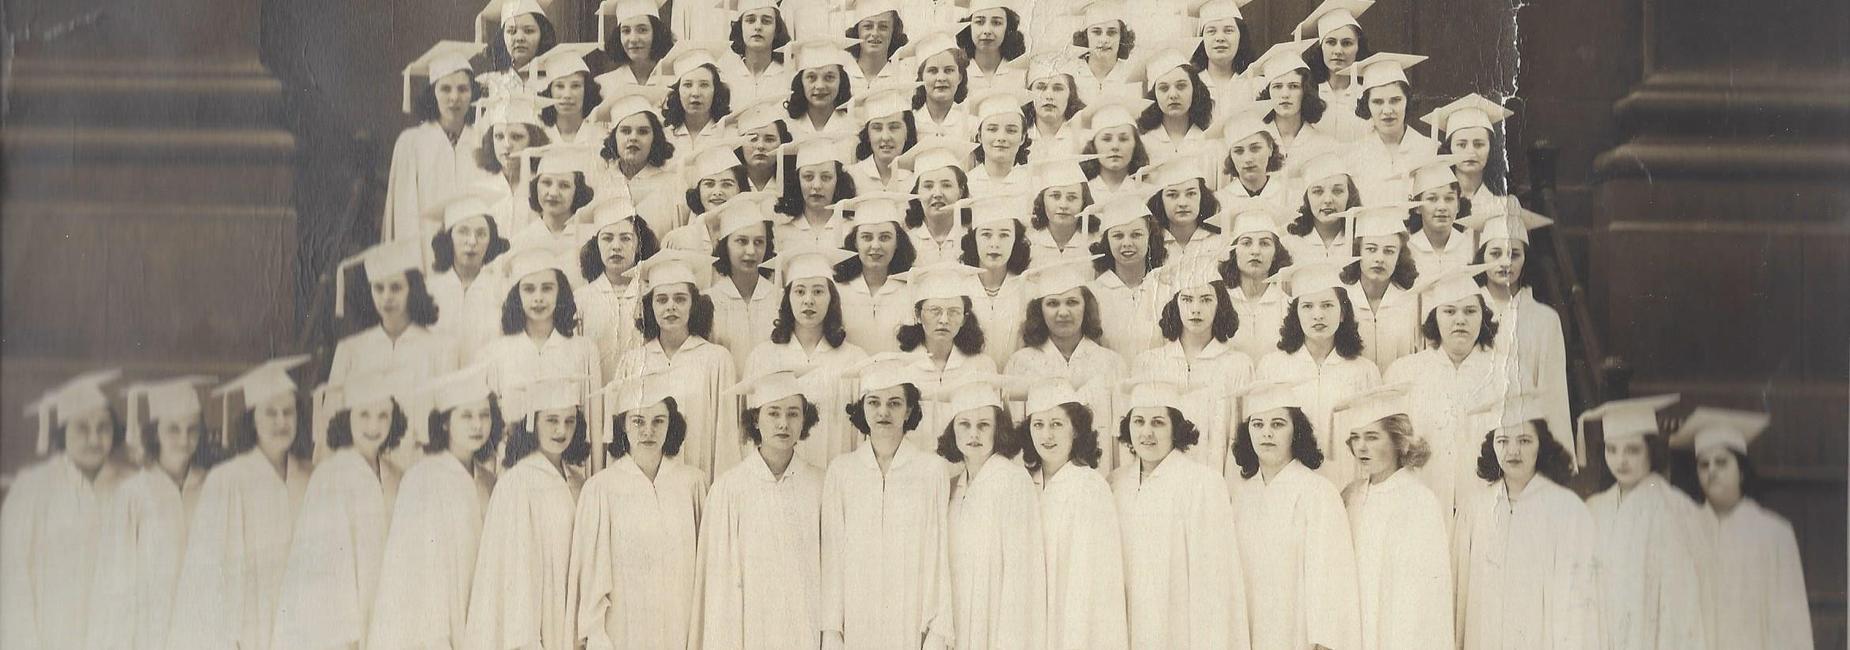 The Graduating Class of 1941